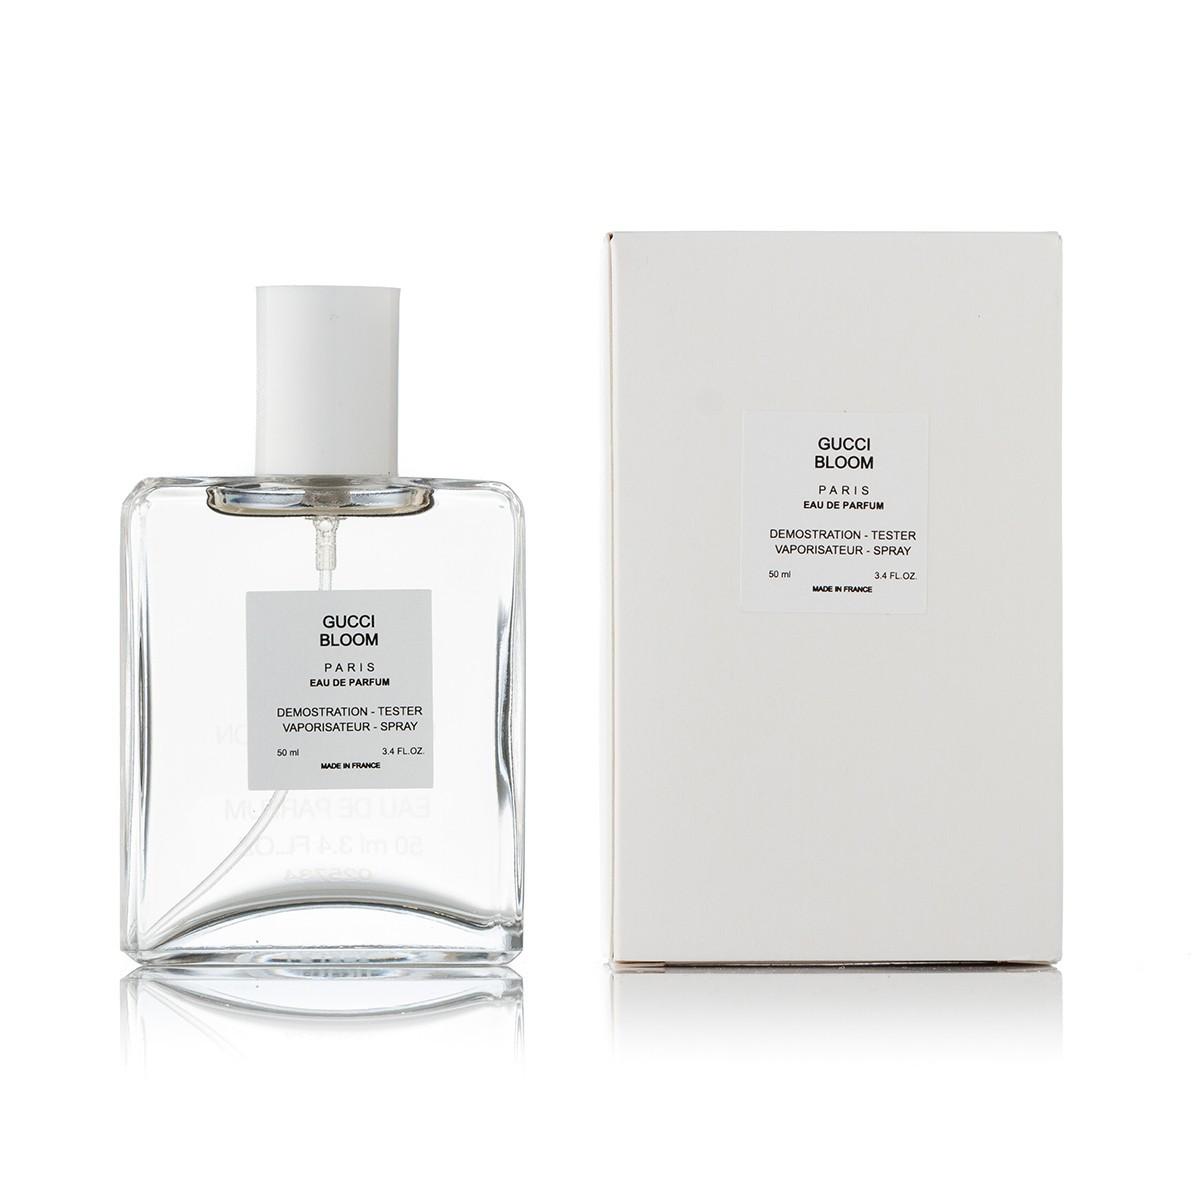 Gucci Bloom - White Tester 50ml